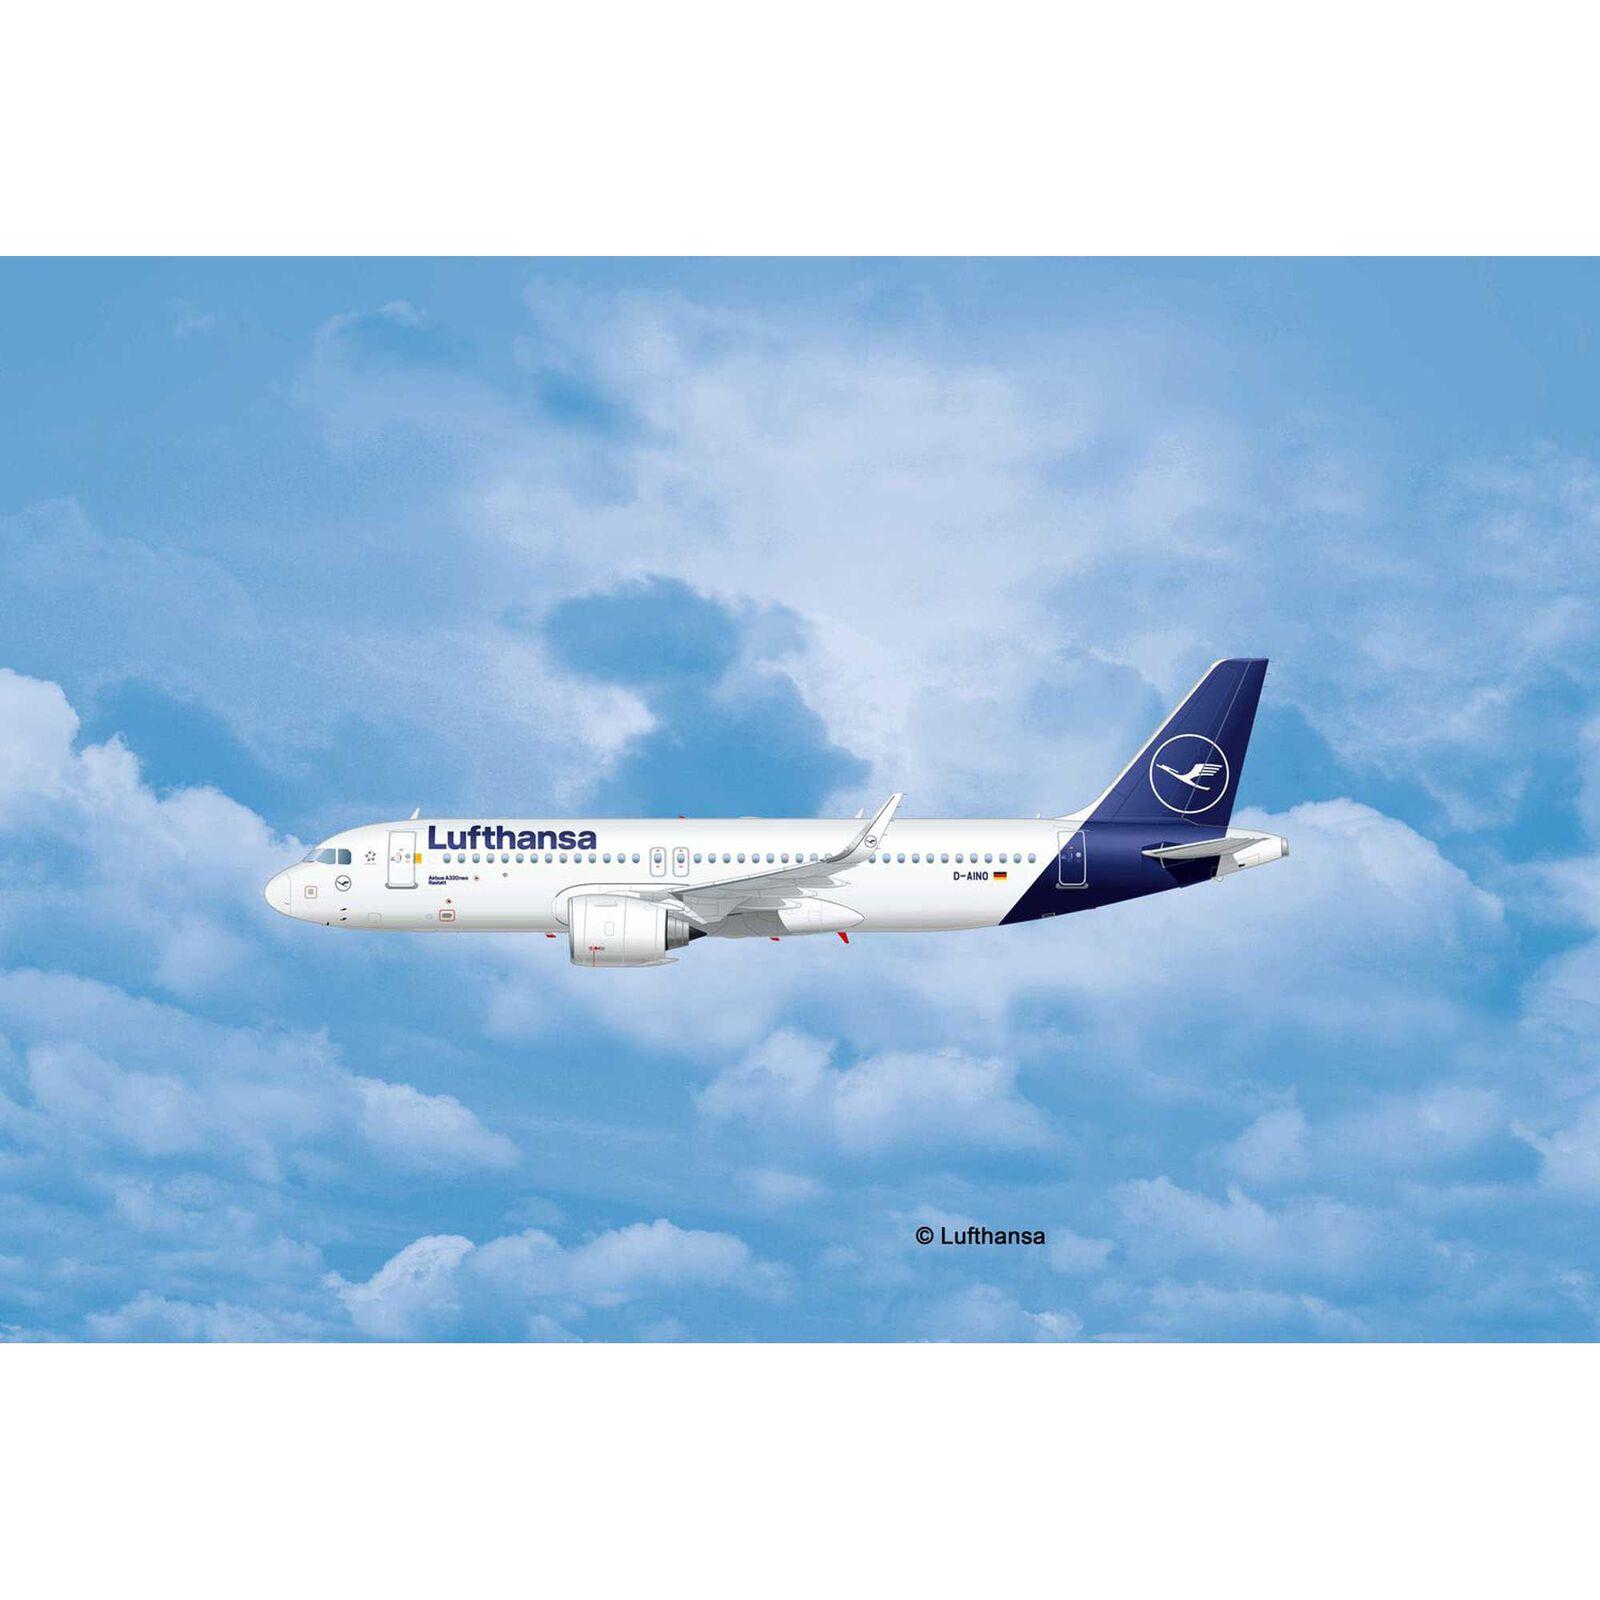 1/144 Airbus A320 neo Lufthansa New Li